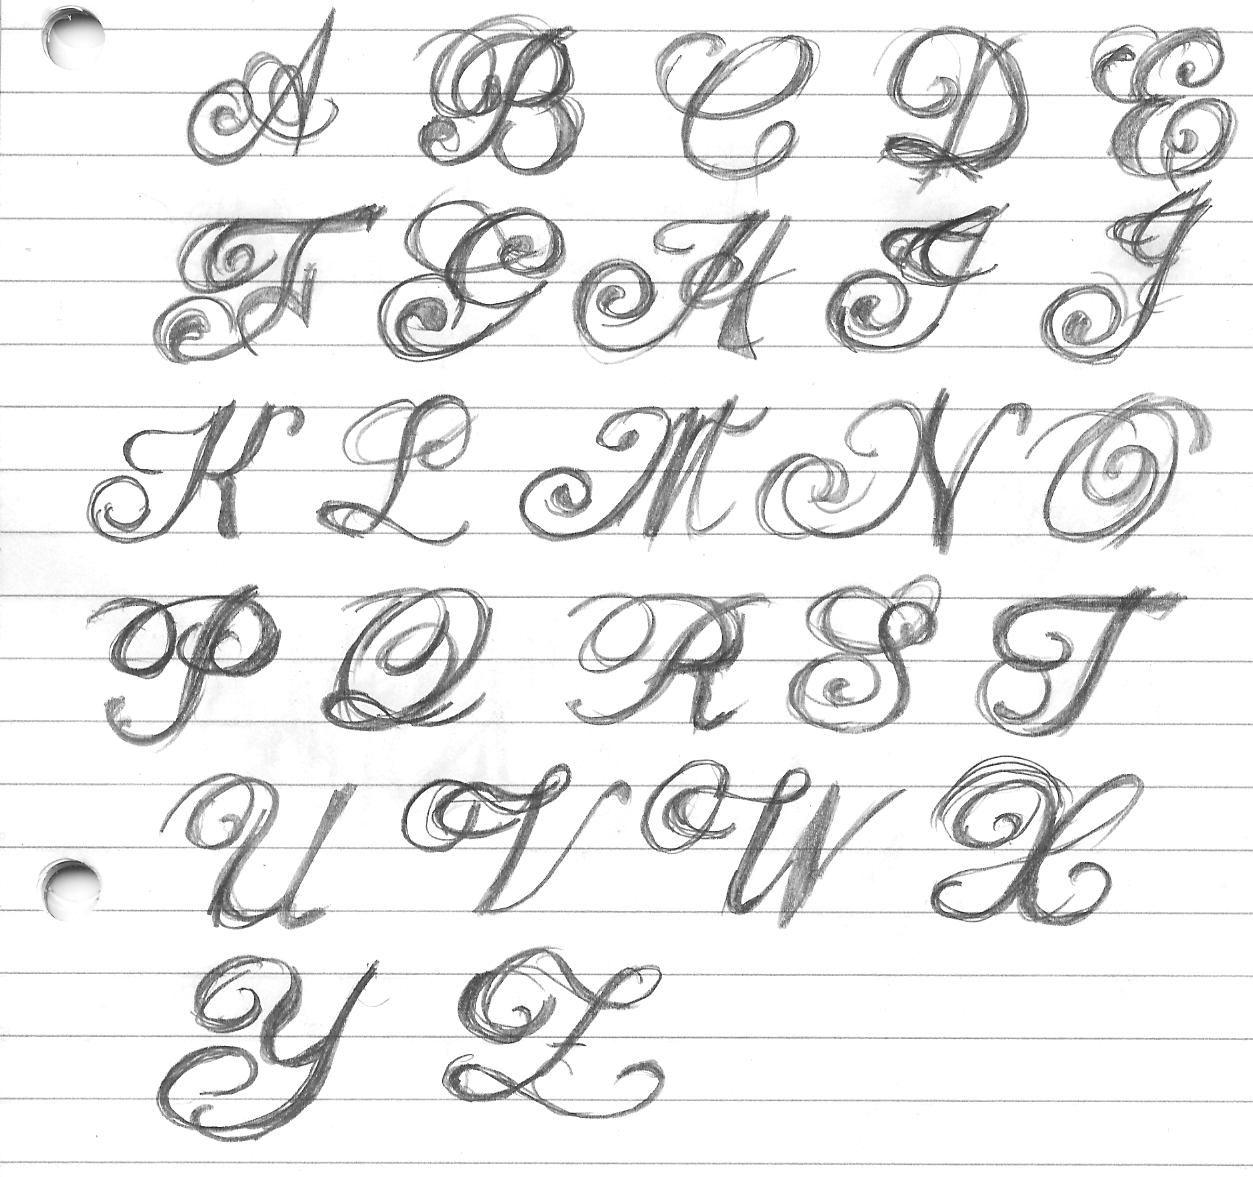 tattoo fonts | alphabet tattoo fonts-317 : image gallery 437 | cute